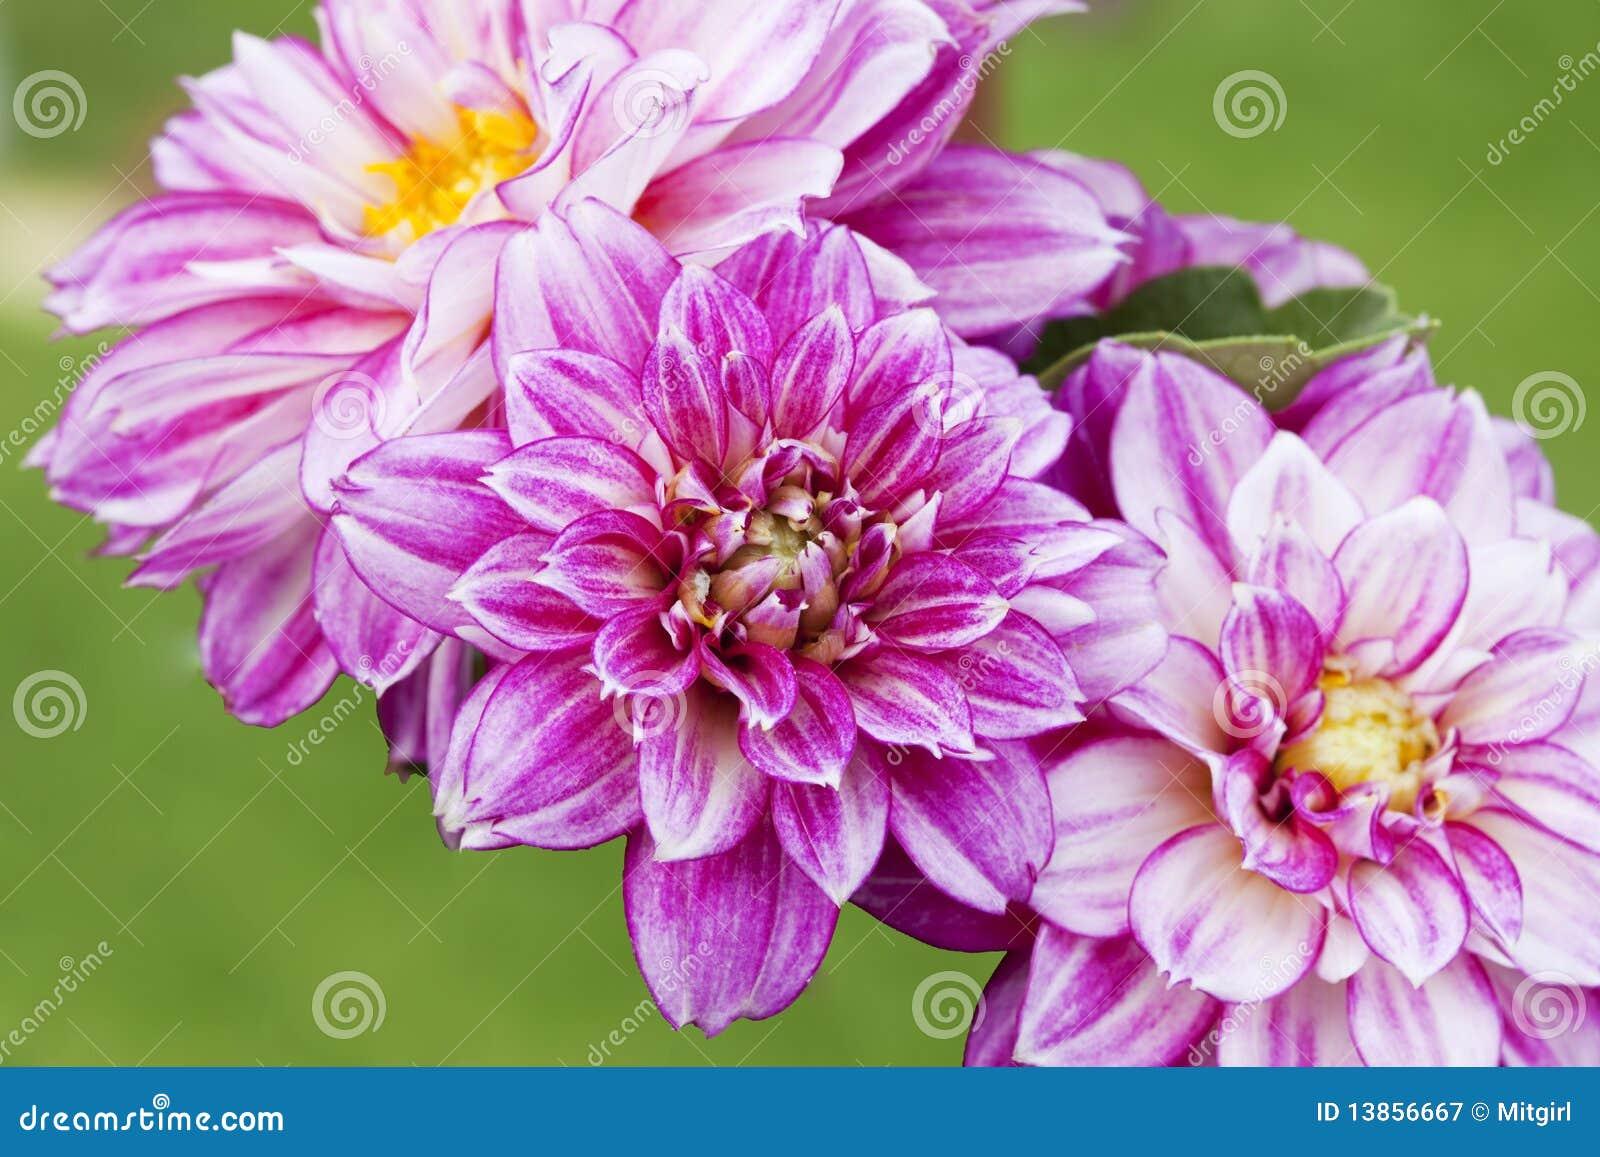 Beautiful pink dahlia flowers stock image image of season download beautiful pink dahlia flowers stock image image of season beautiful 13856667 izmirmasajfo